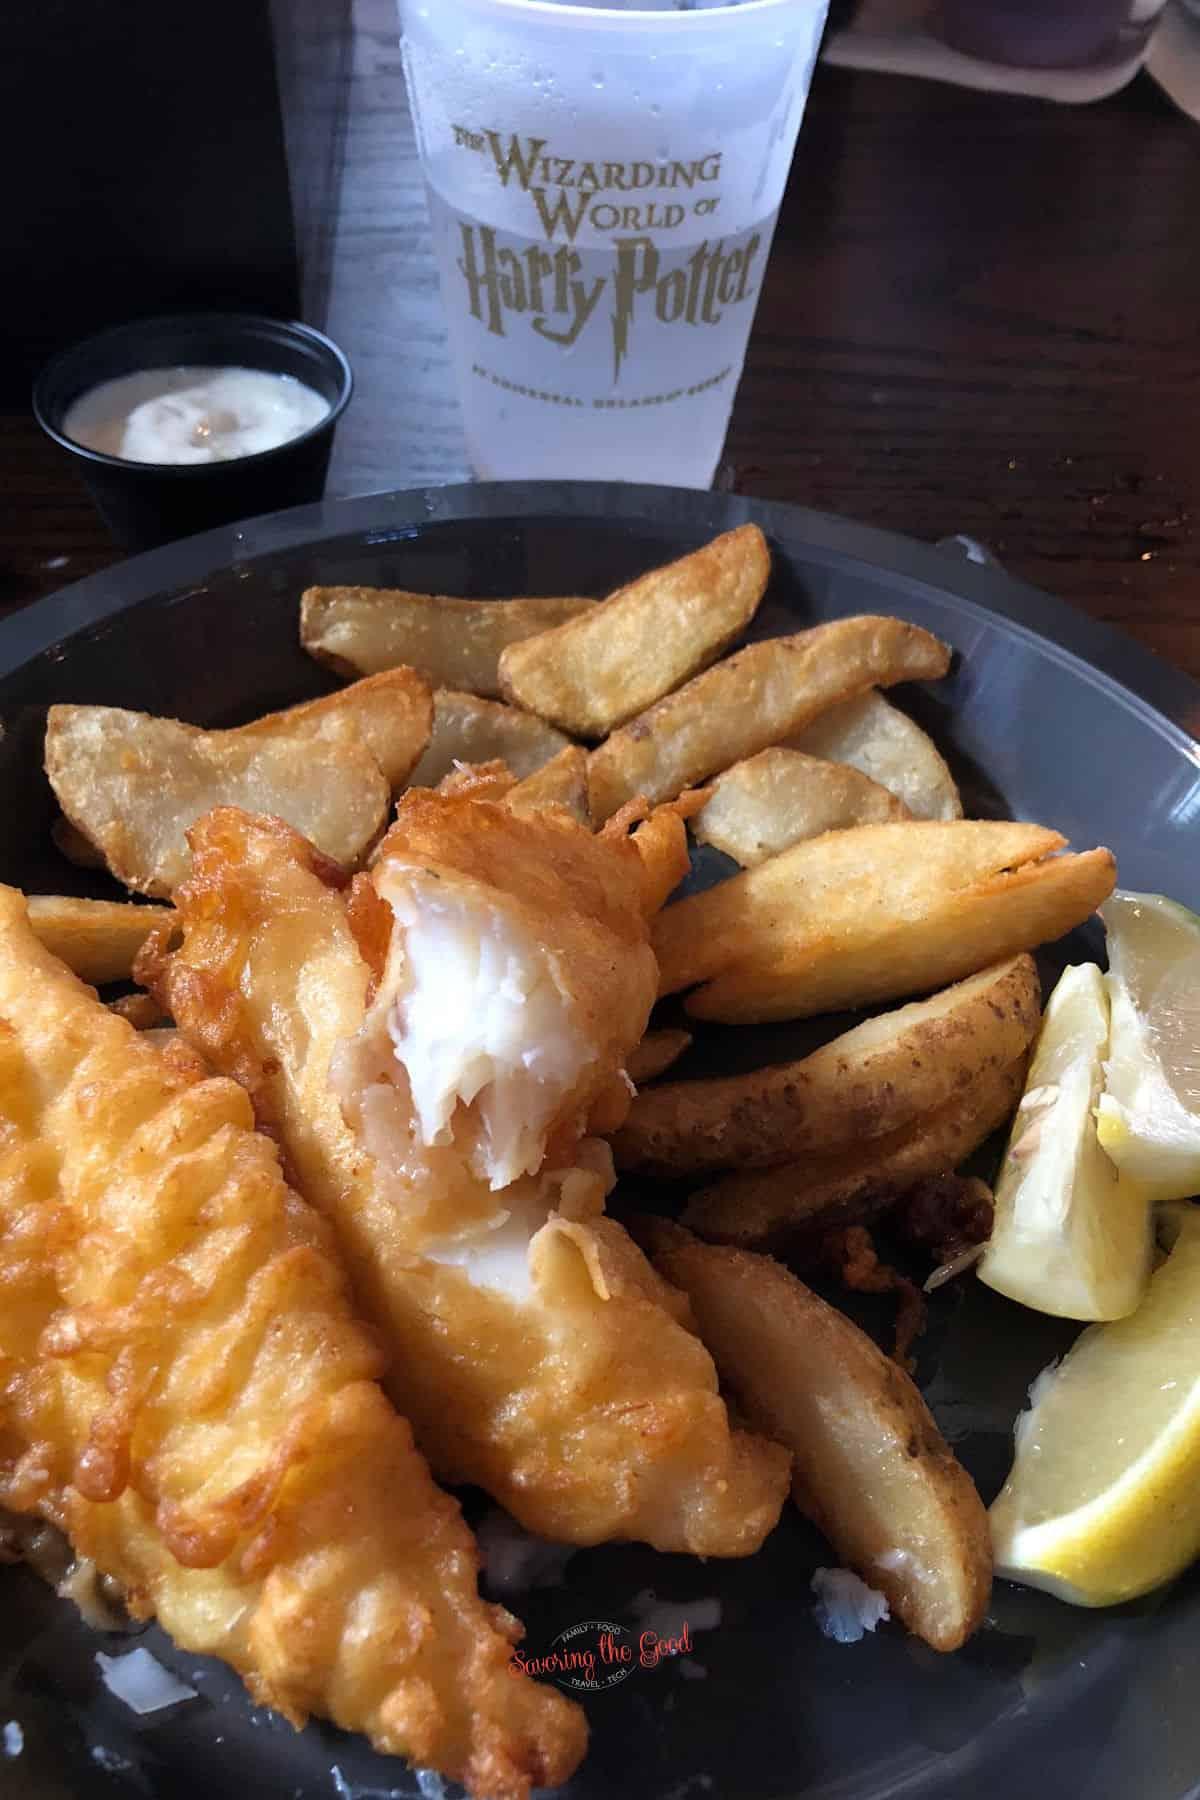 fish and chipp platter with lemon wedge garnish